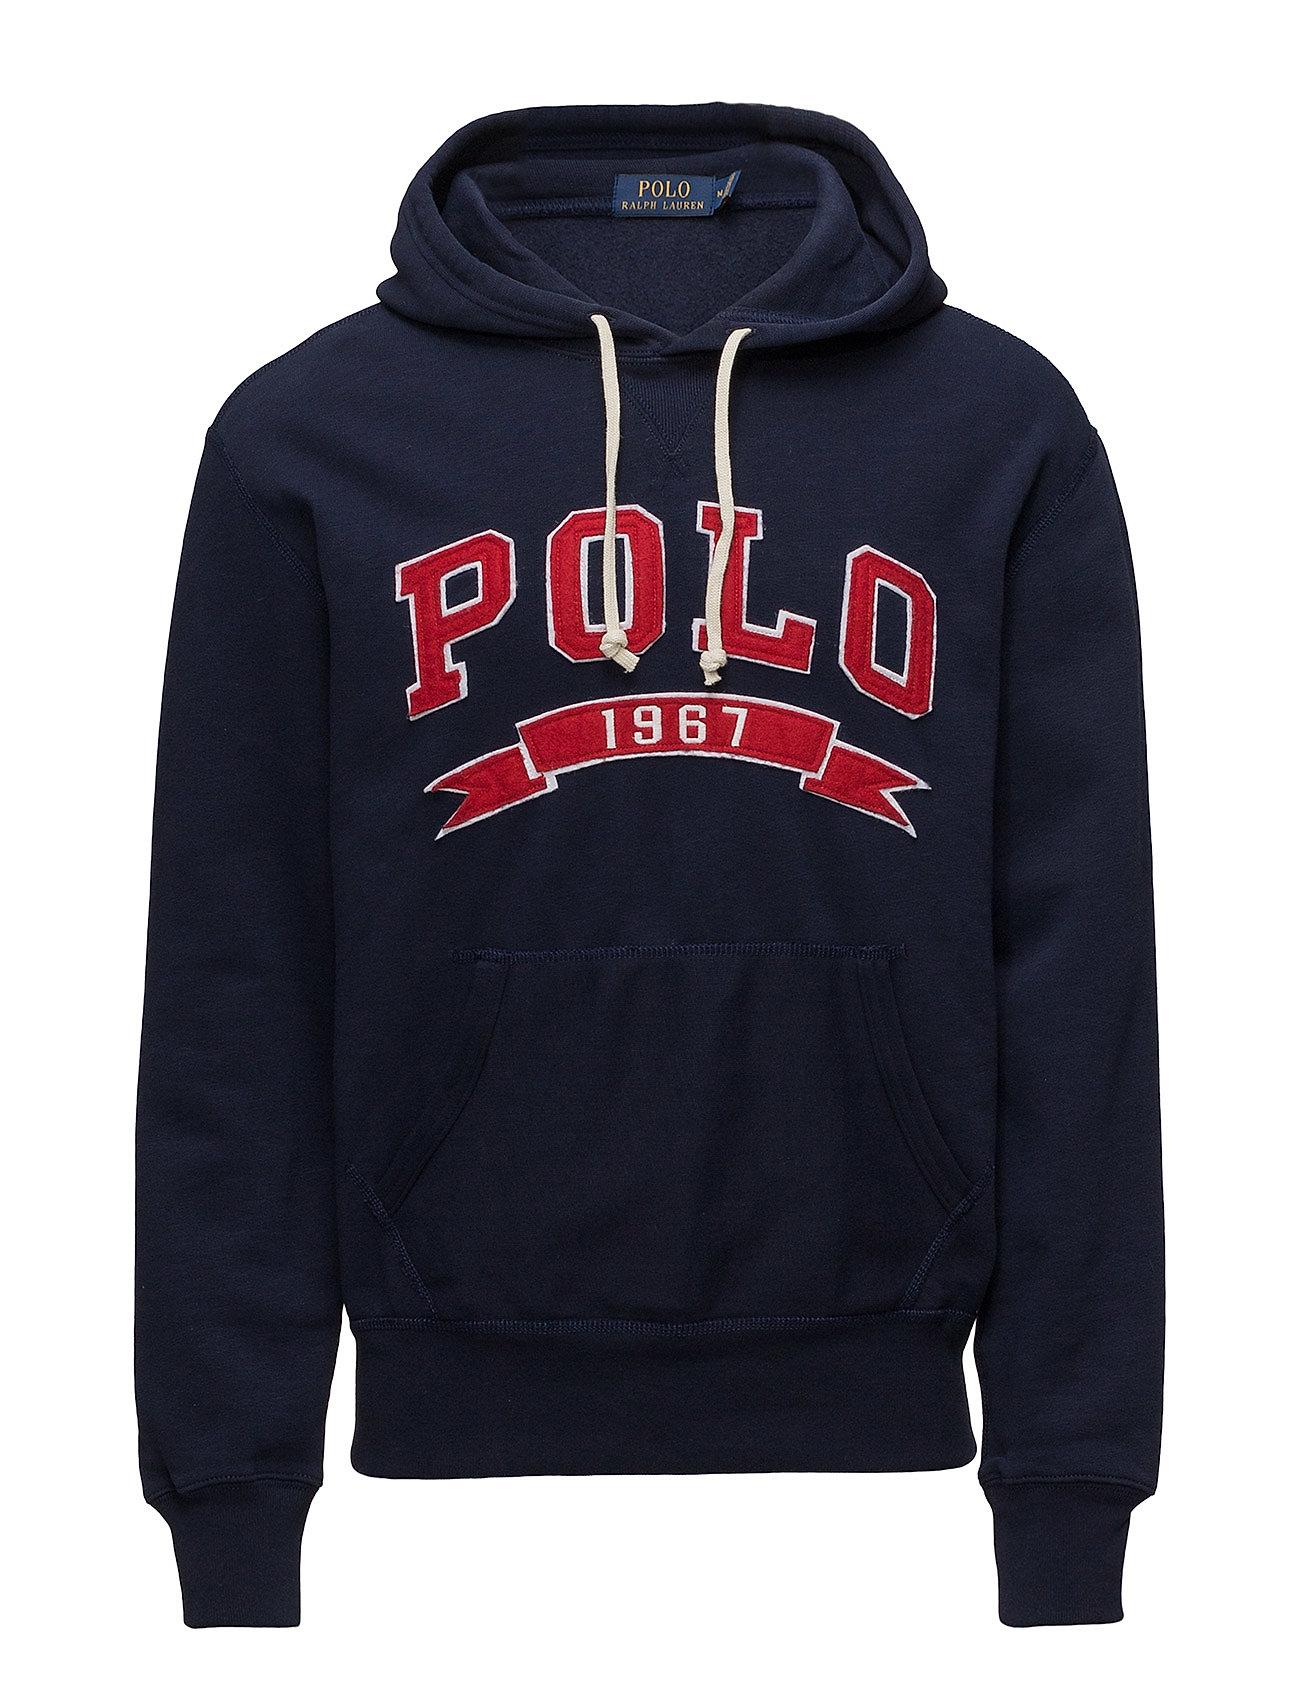 Polo Ralph Lauren Cotton-Blend-Fleece Hoodie